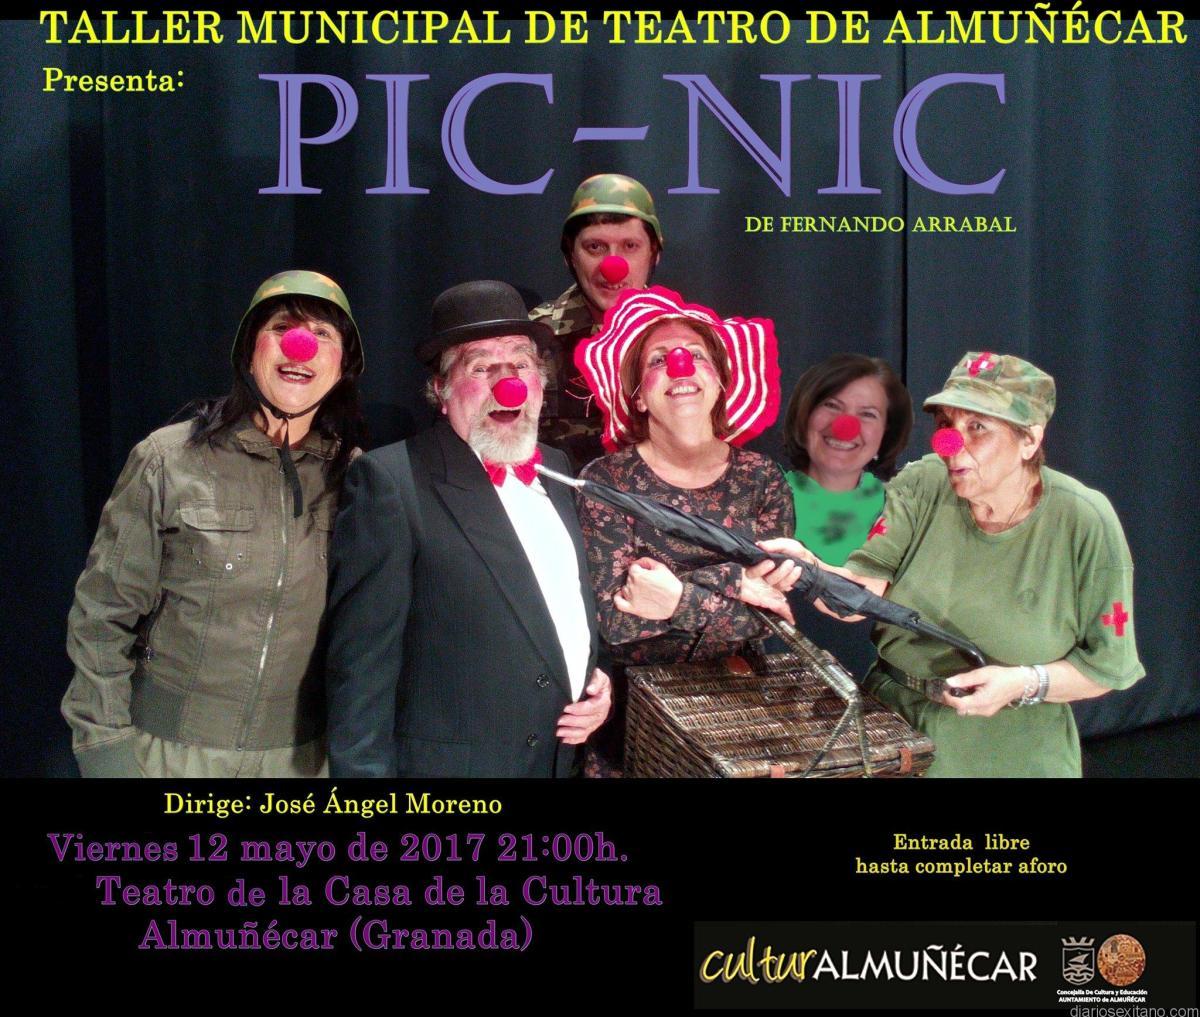 "El Taller Municipal de Teatro de Almuñécar representa este viernes la obra de Femando Arrabal ""Pic Nic"" en la Casa de la Cultura sexitana."